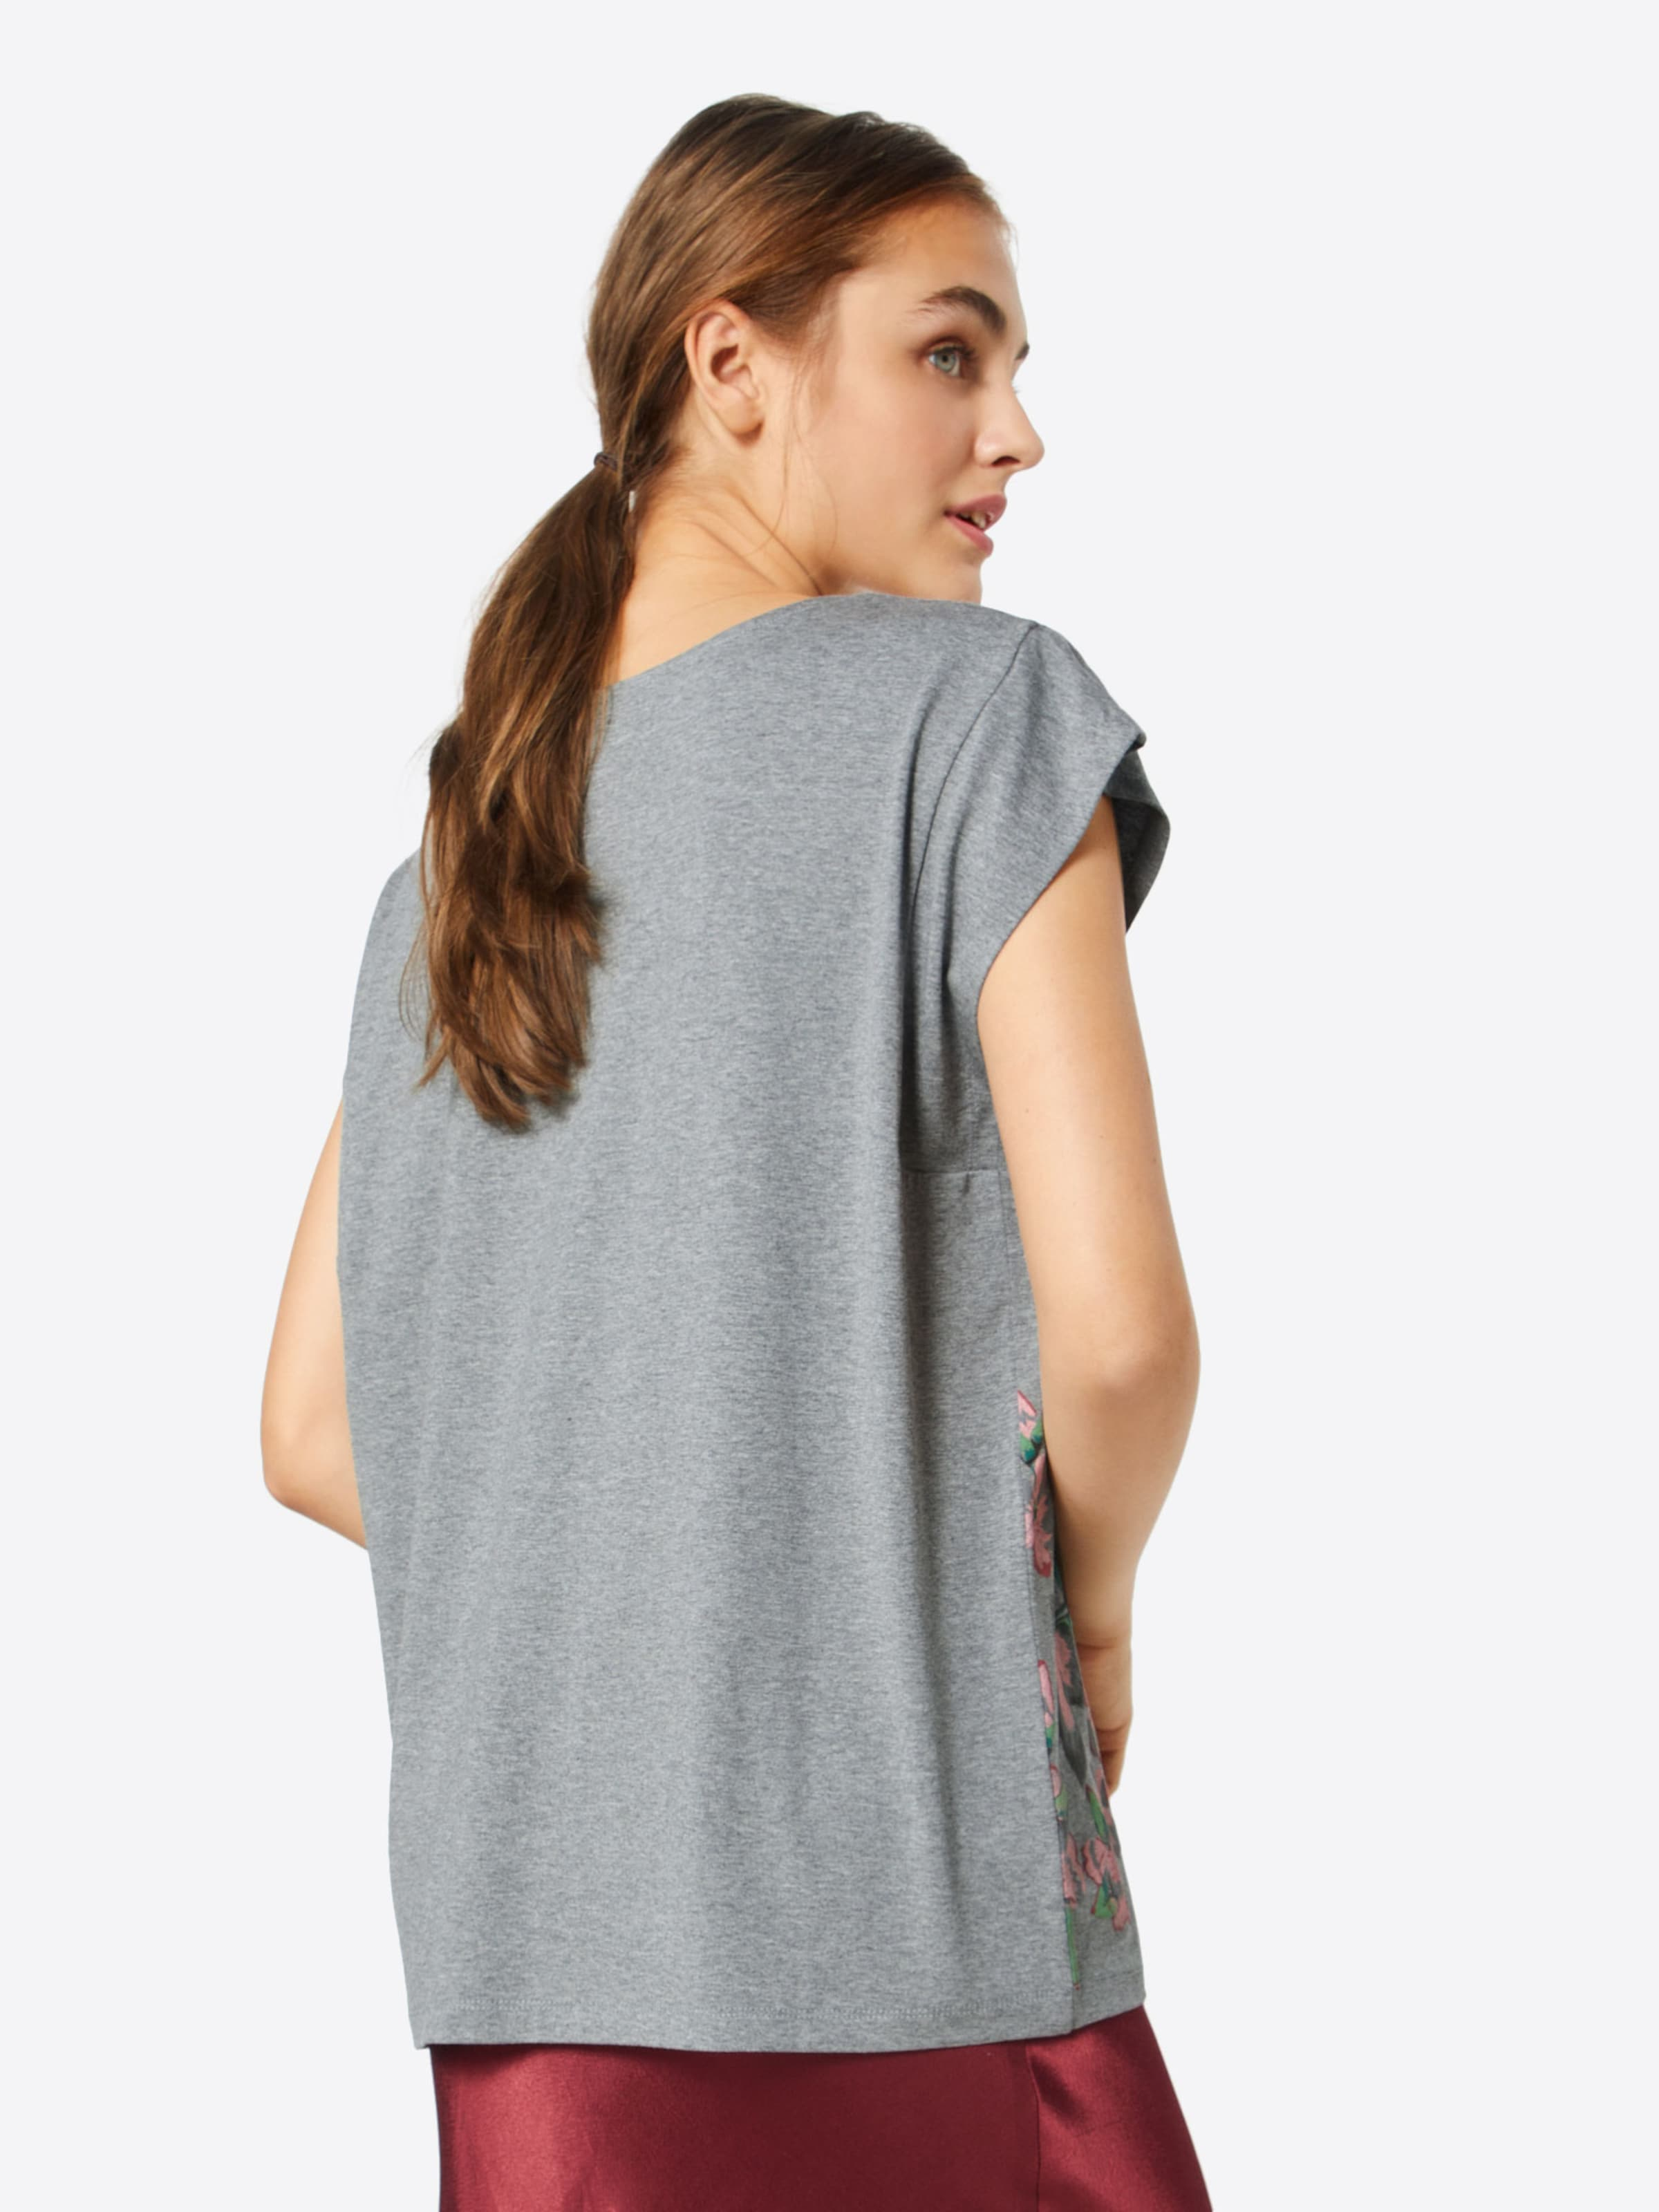 You In About Shirt Graumeliert 'sabrina' uT1JclK3F